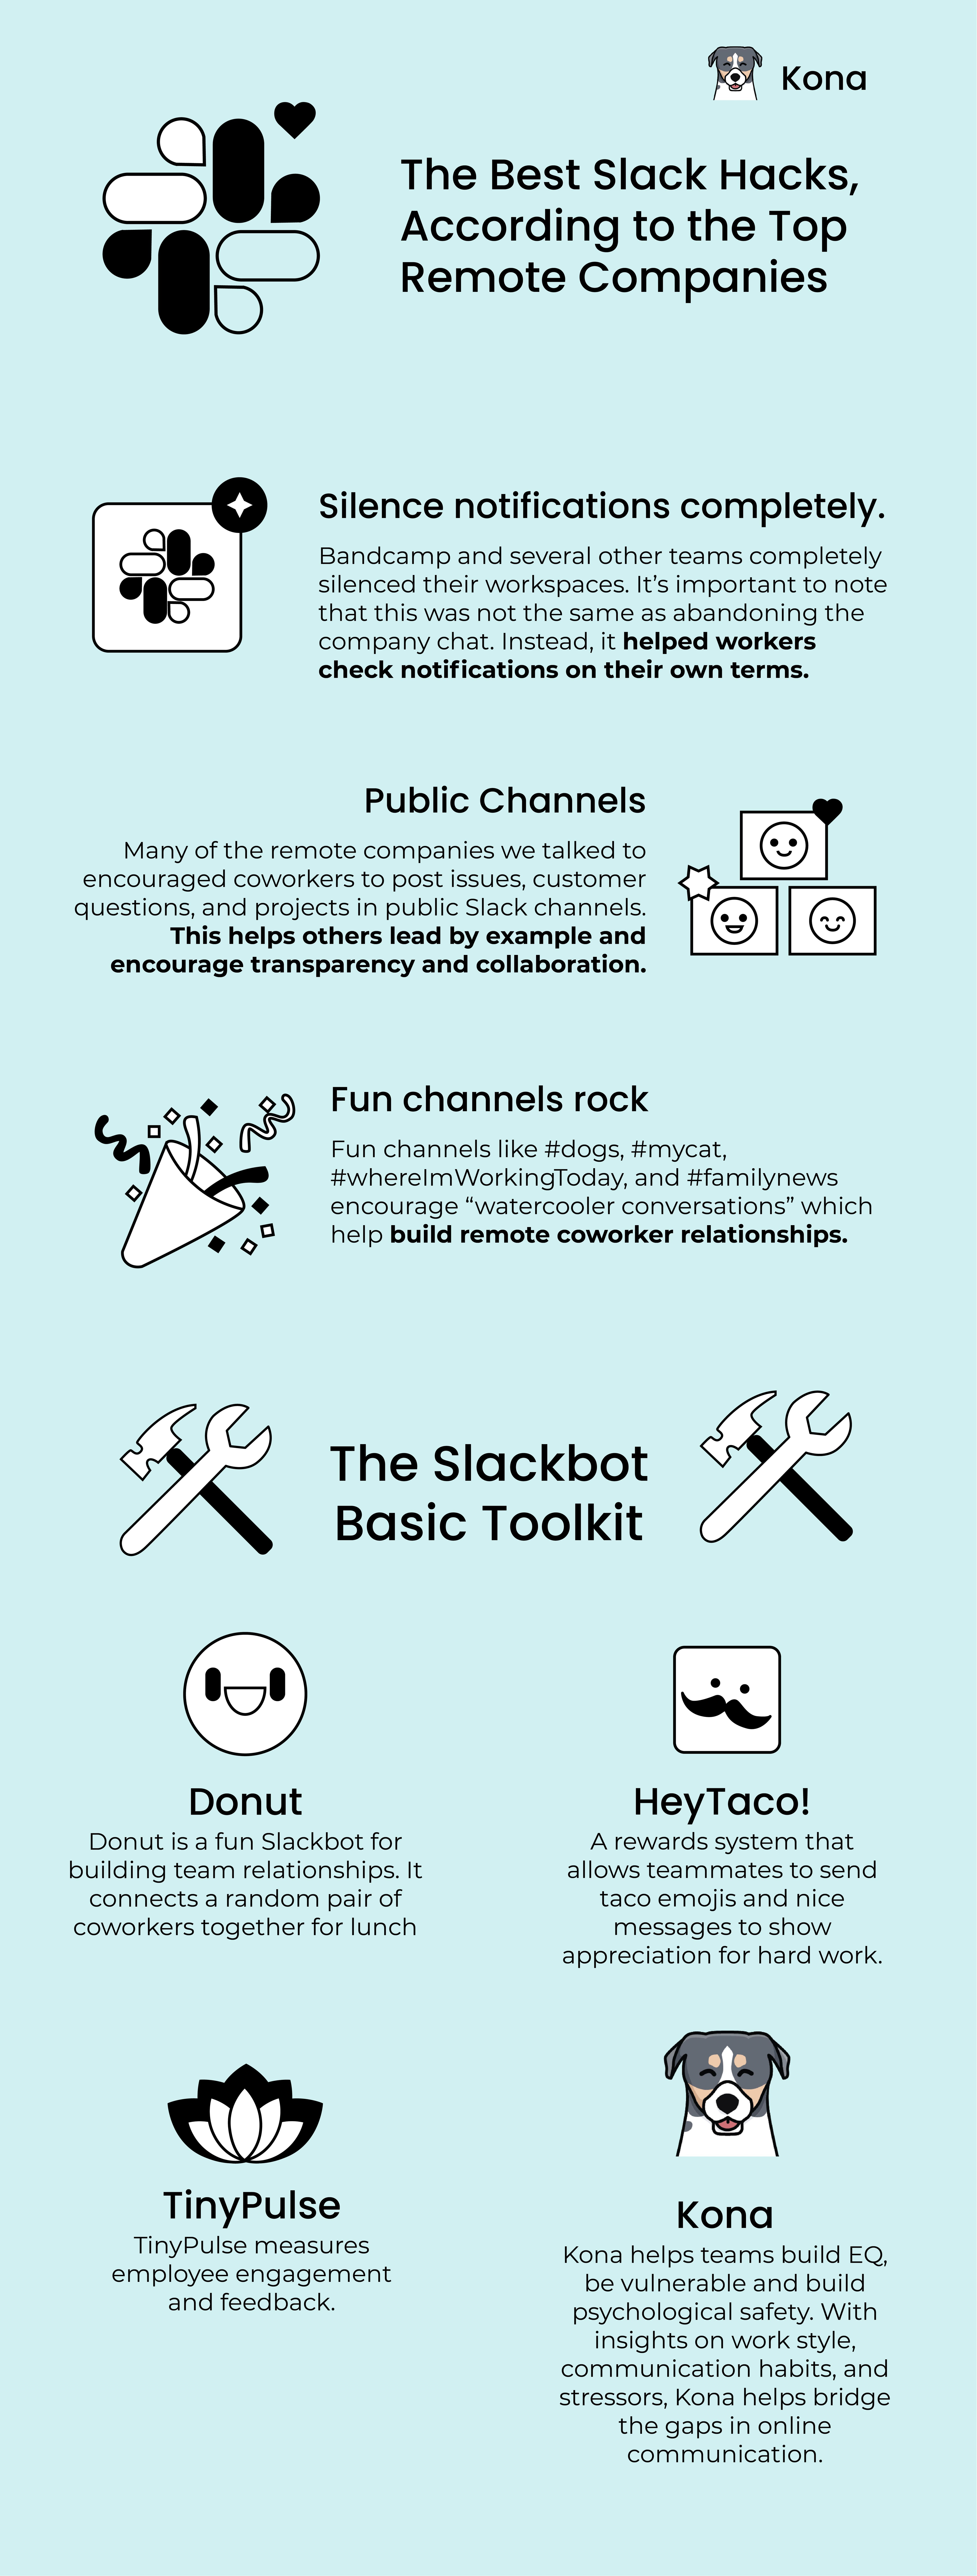 A long, light blue infographic listing out major Slack hacks.